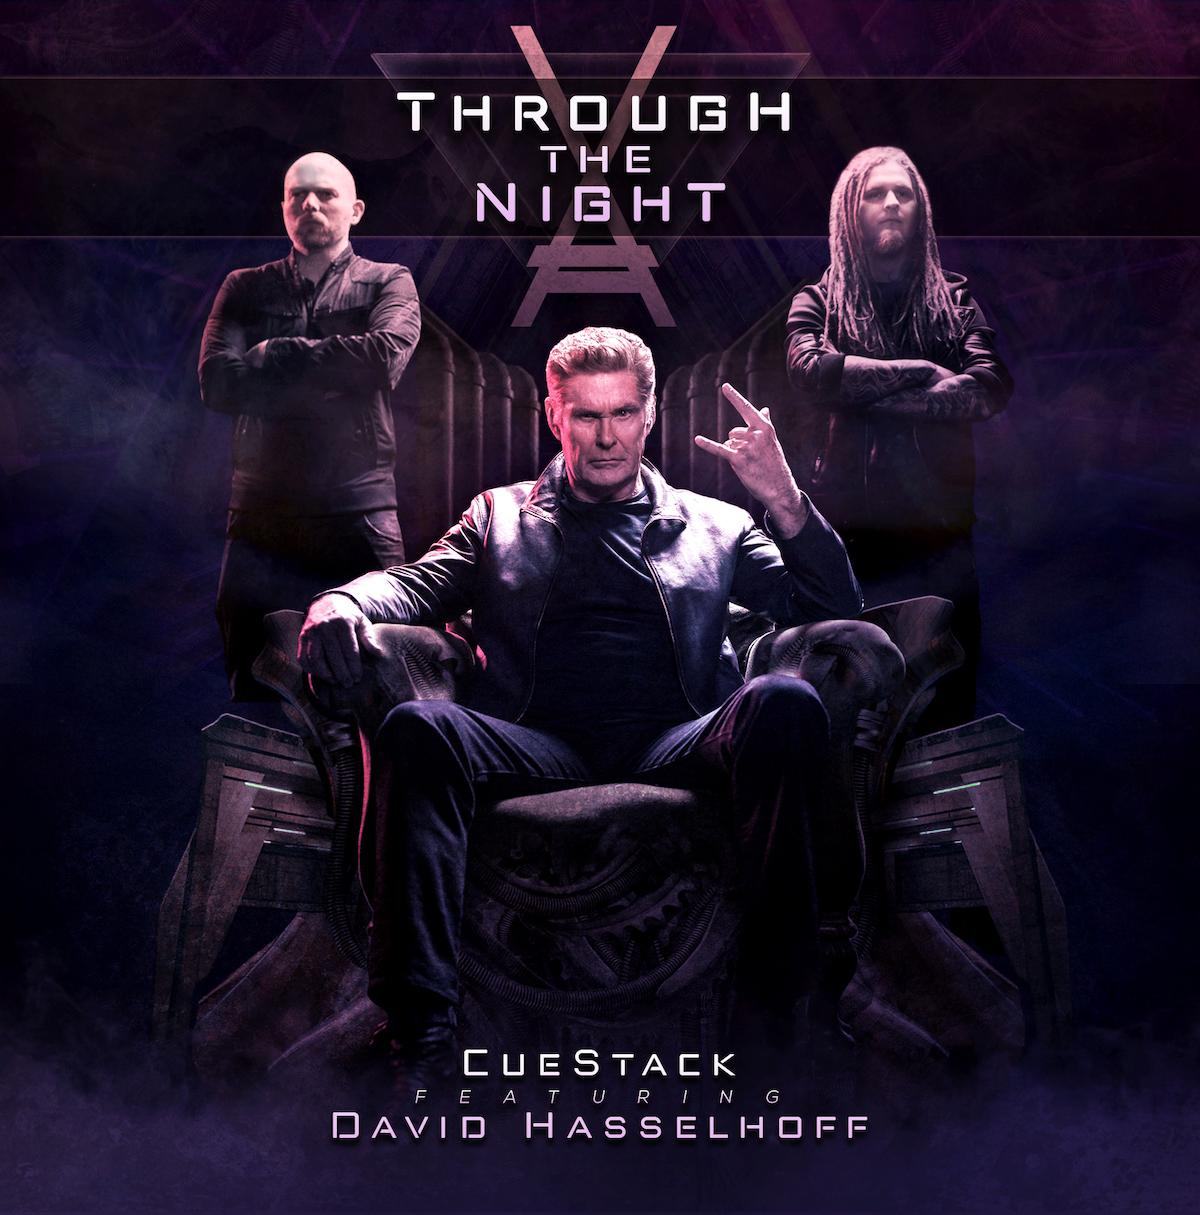 Hassehoff CueStack Through the Night artwork